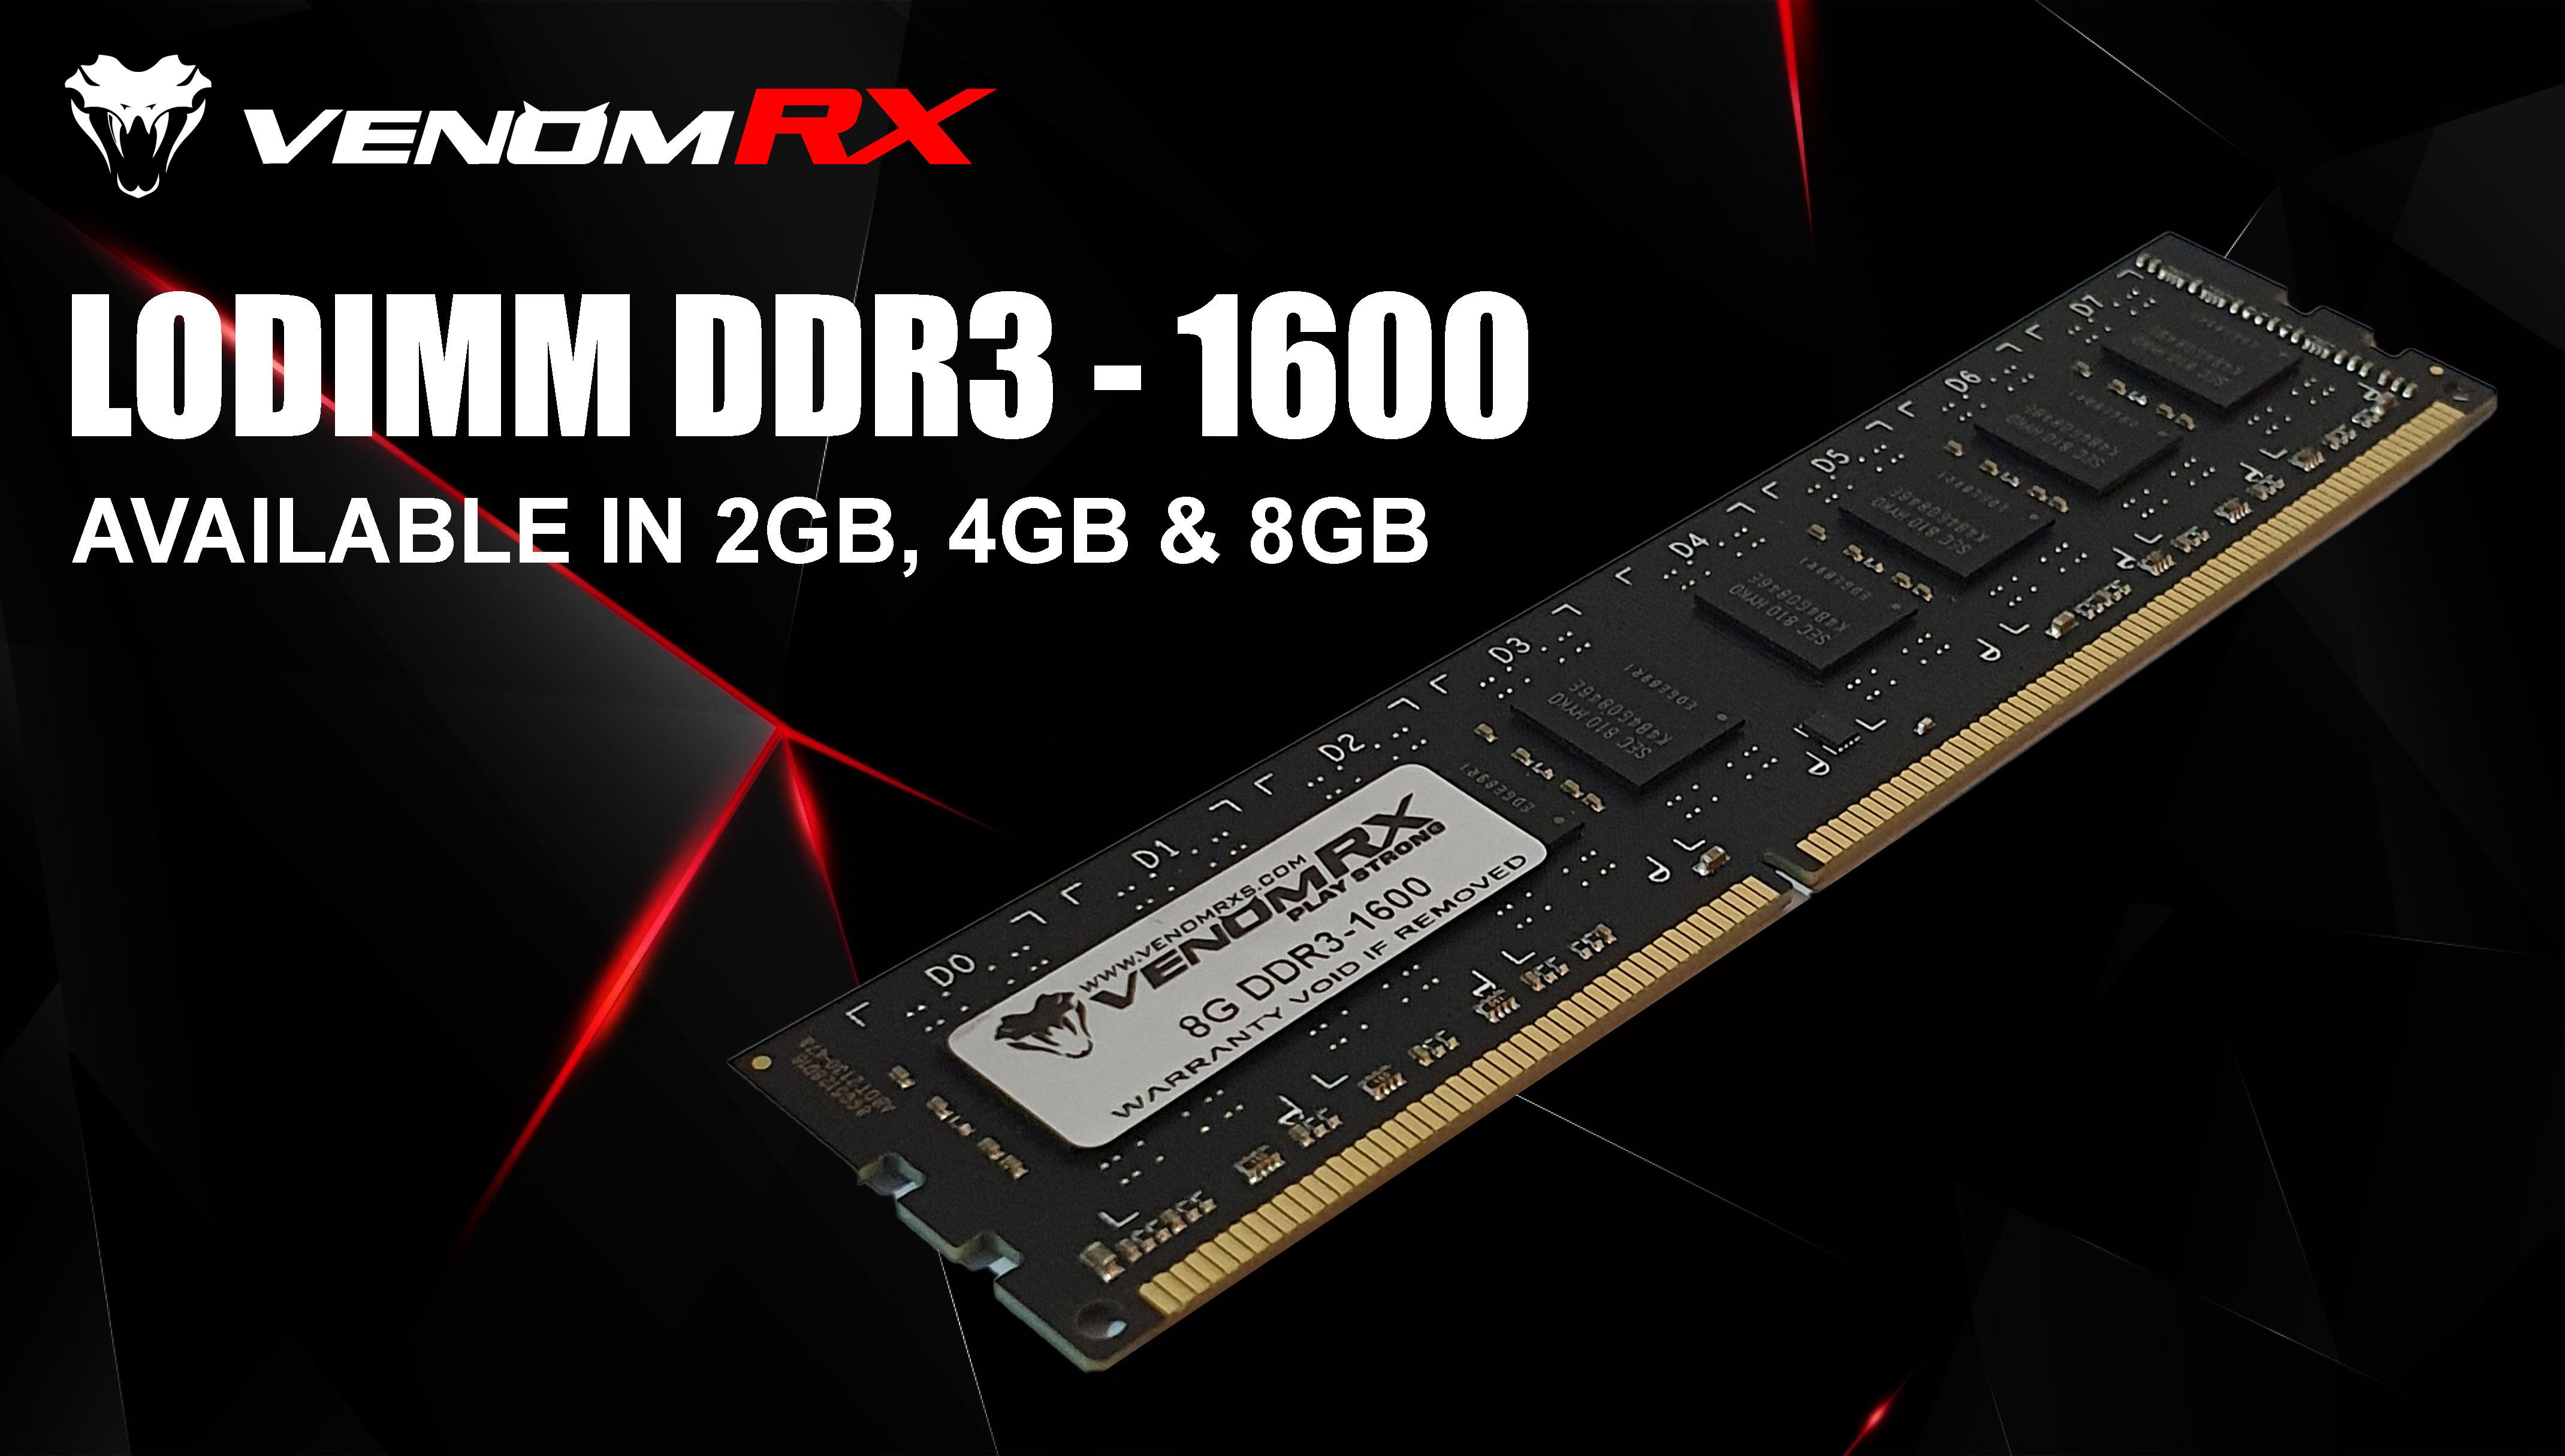 venomrx-lodimm-ddr3-1600-1